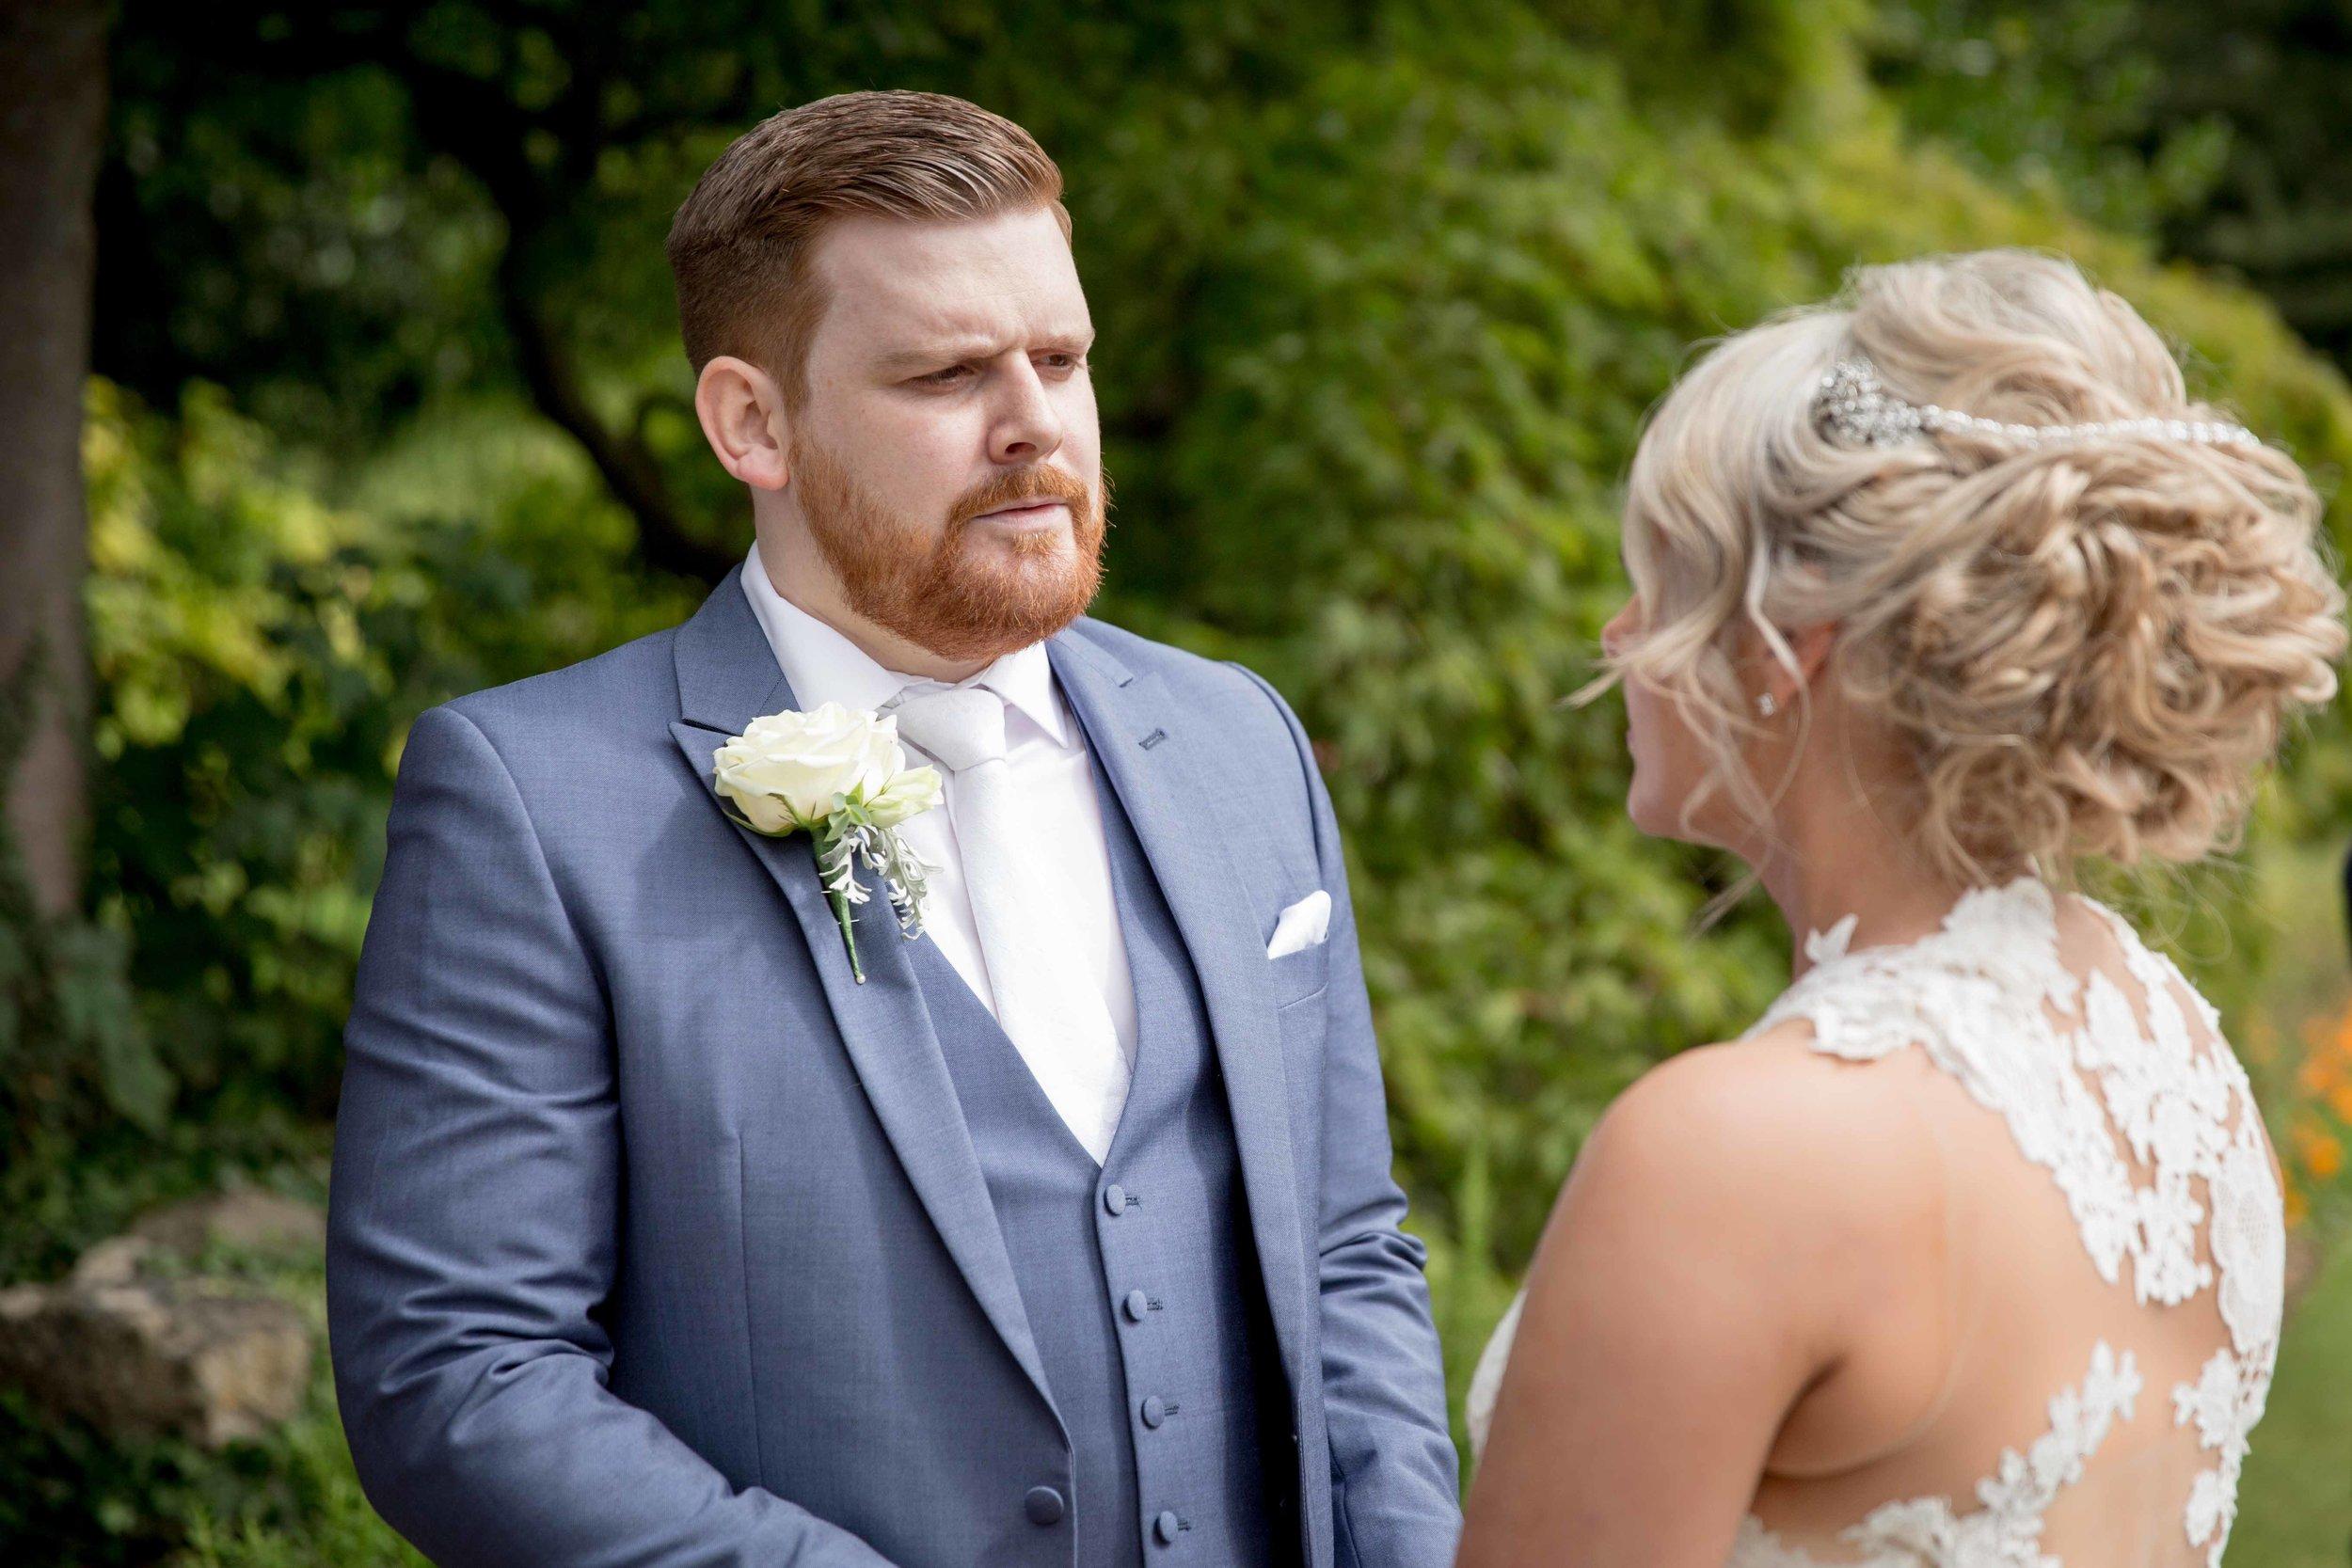 cotswold-wedding-photography-at-stonehouse-court-hotel-natalia-smith-photography-gloucestershire-wedding-photographer-18.jpg